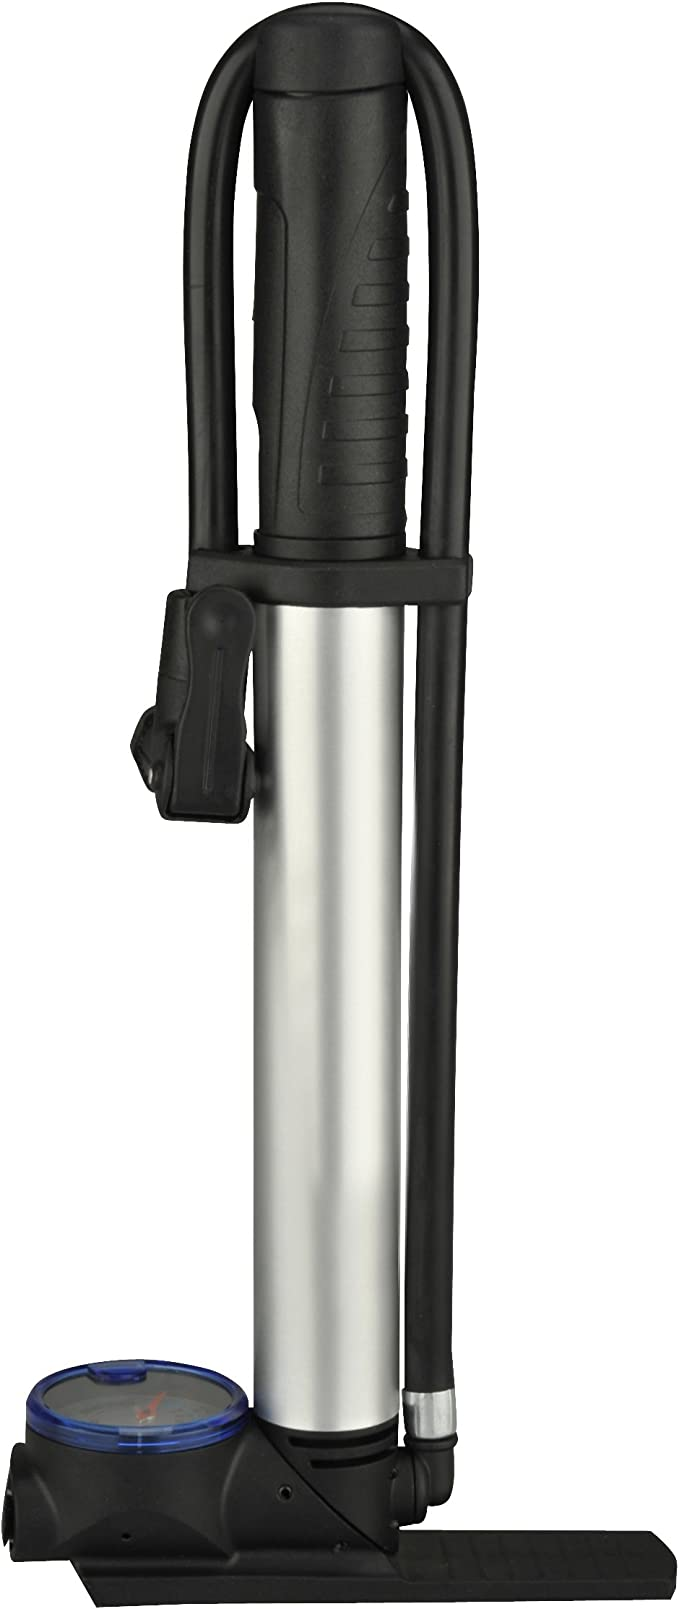 CO2 Zylinder schwarz Fahrrad Reifenfüller Kopf Mini Hand Pumpenkopf Fahrrad